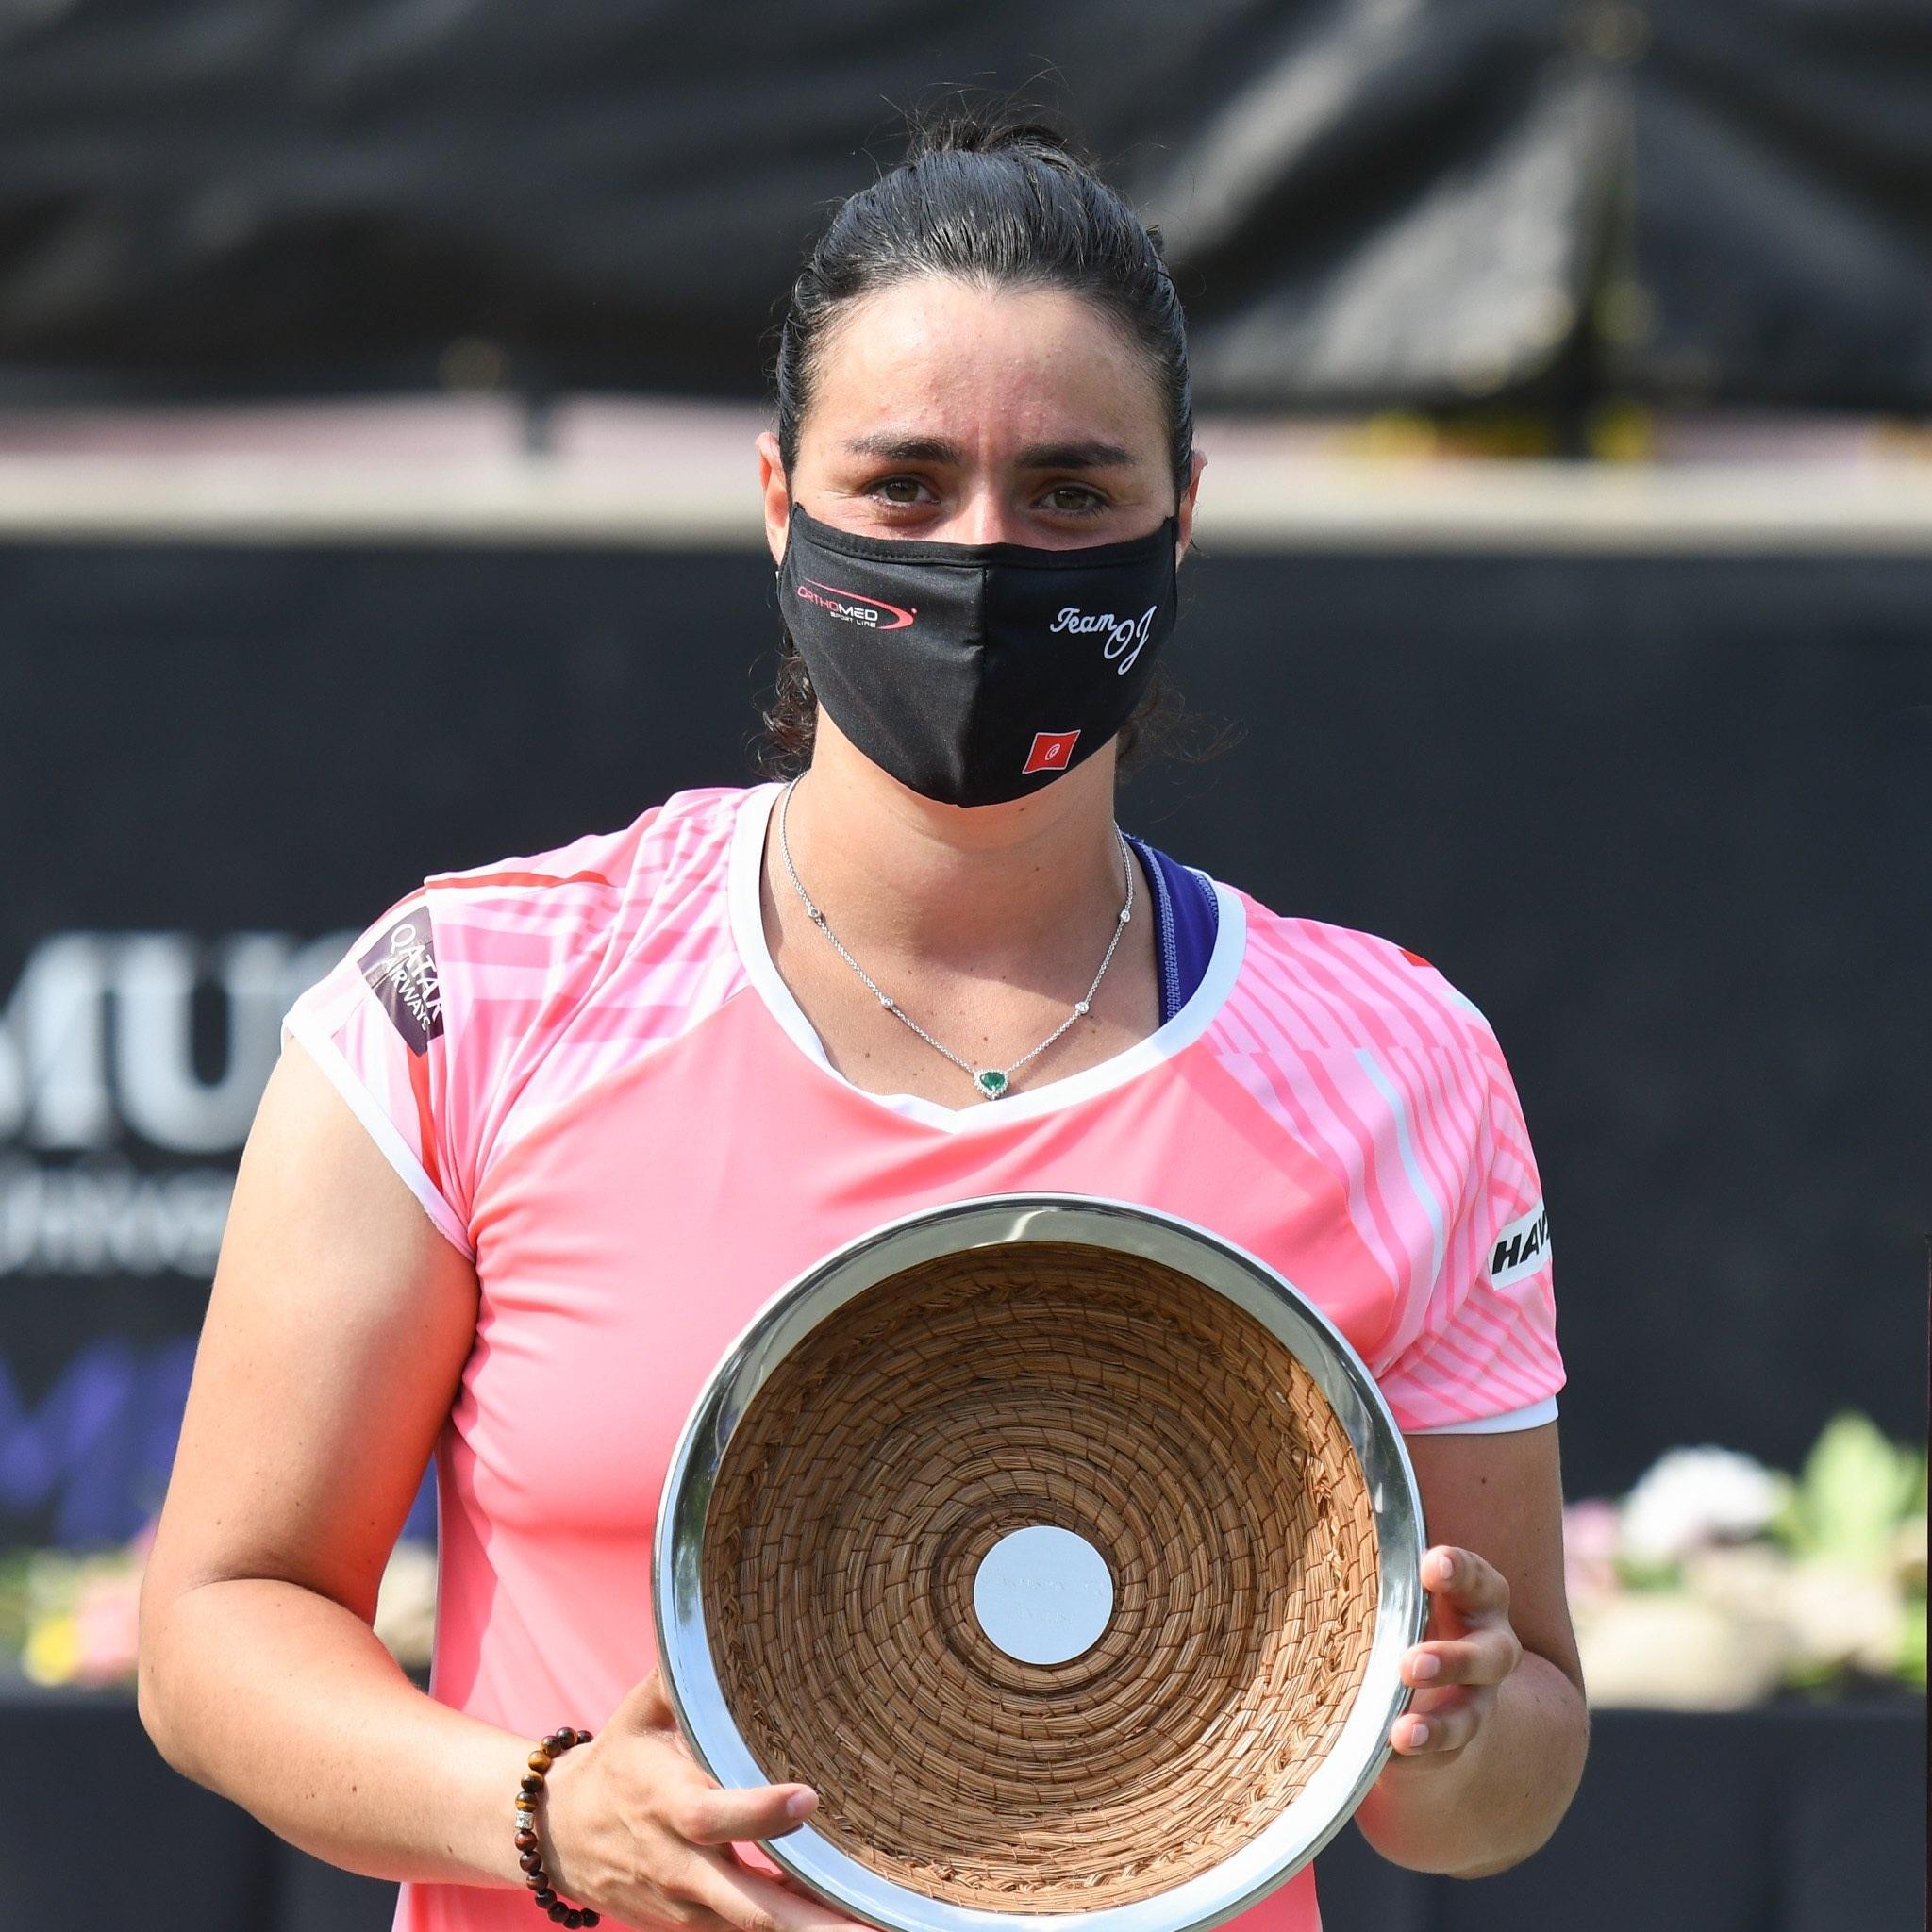 Tunisian Muslim tennis star Ons Jabeur